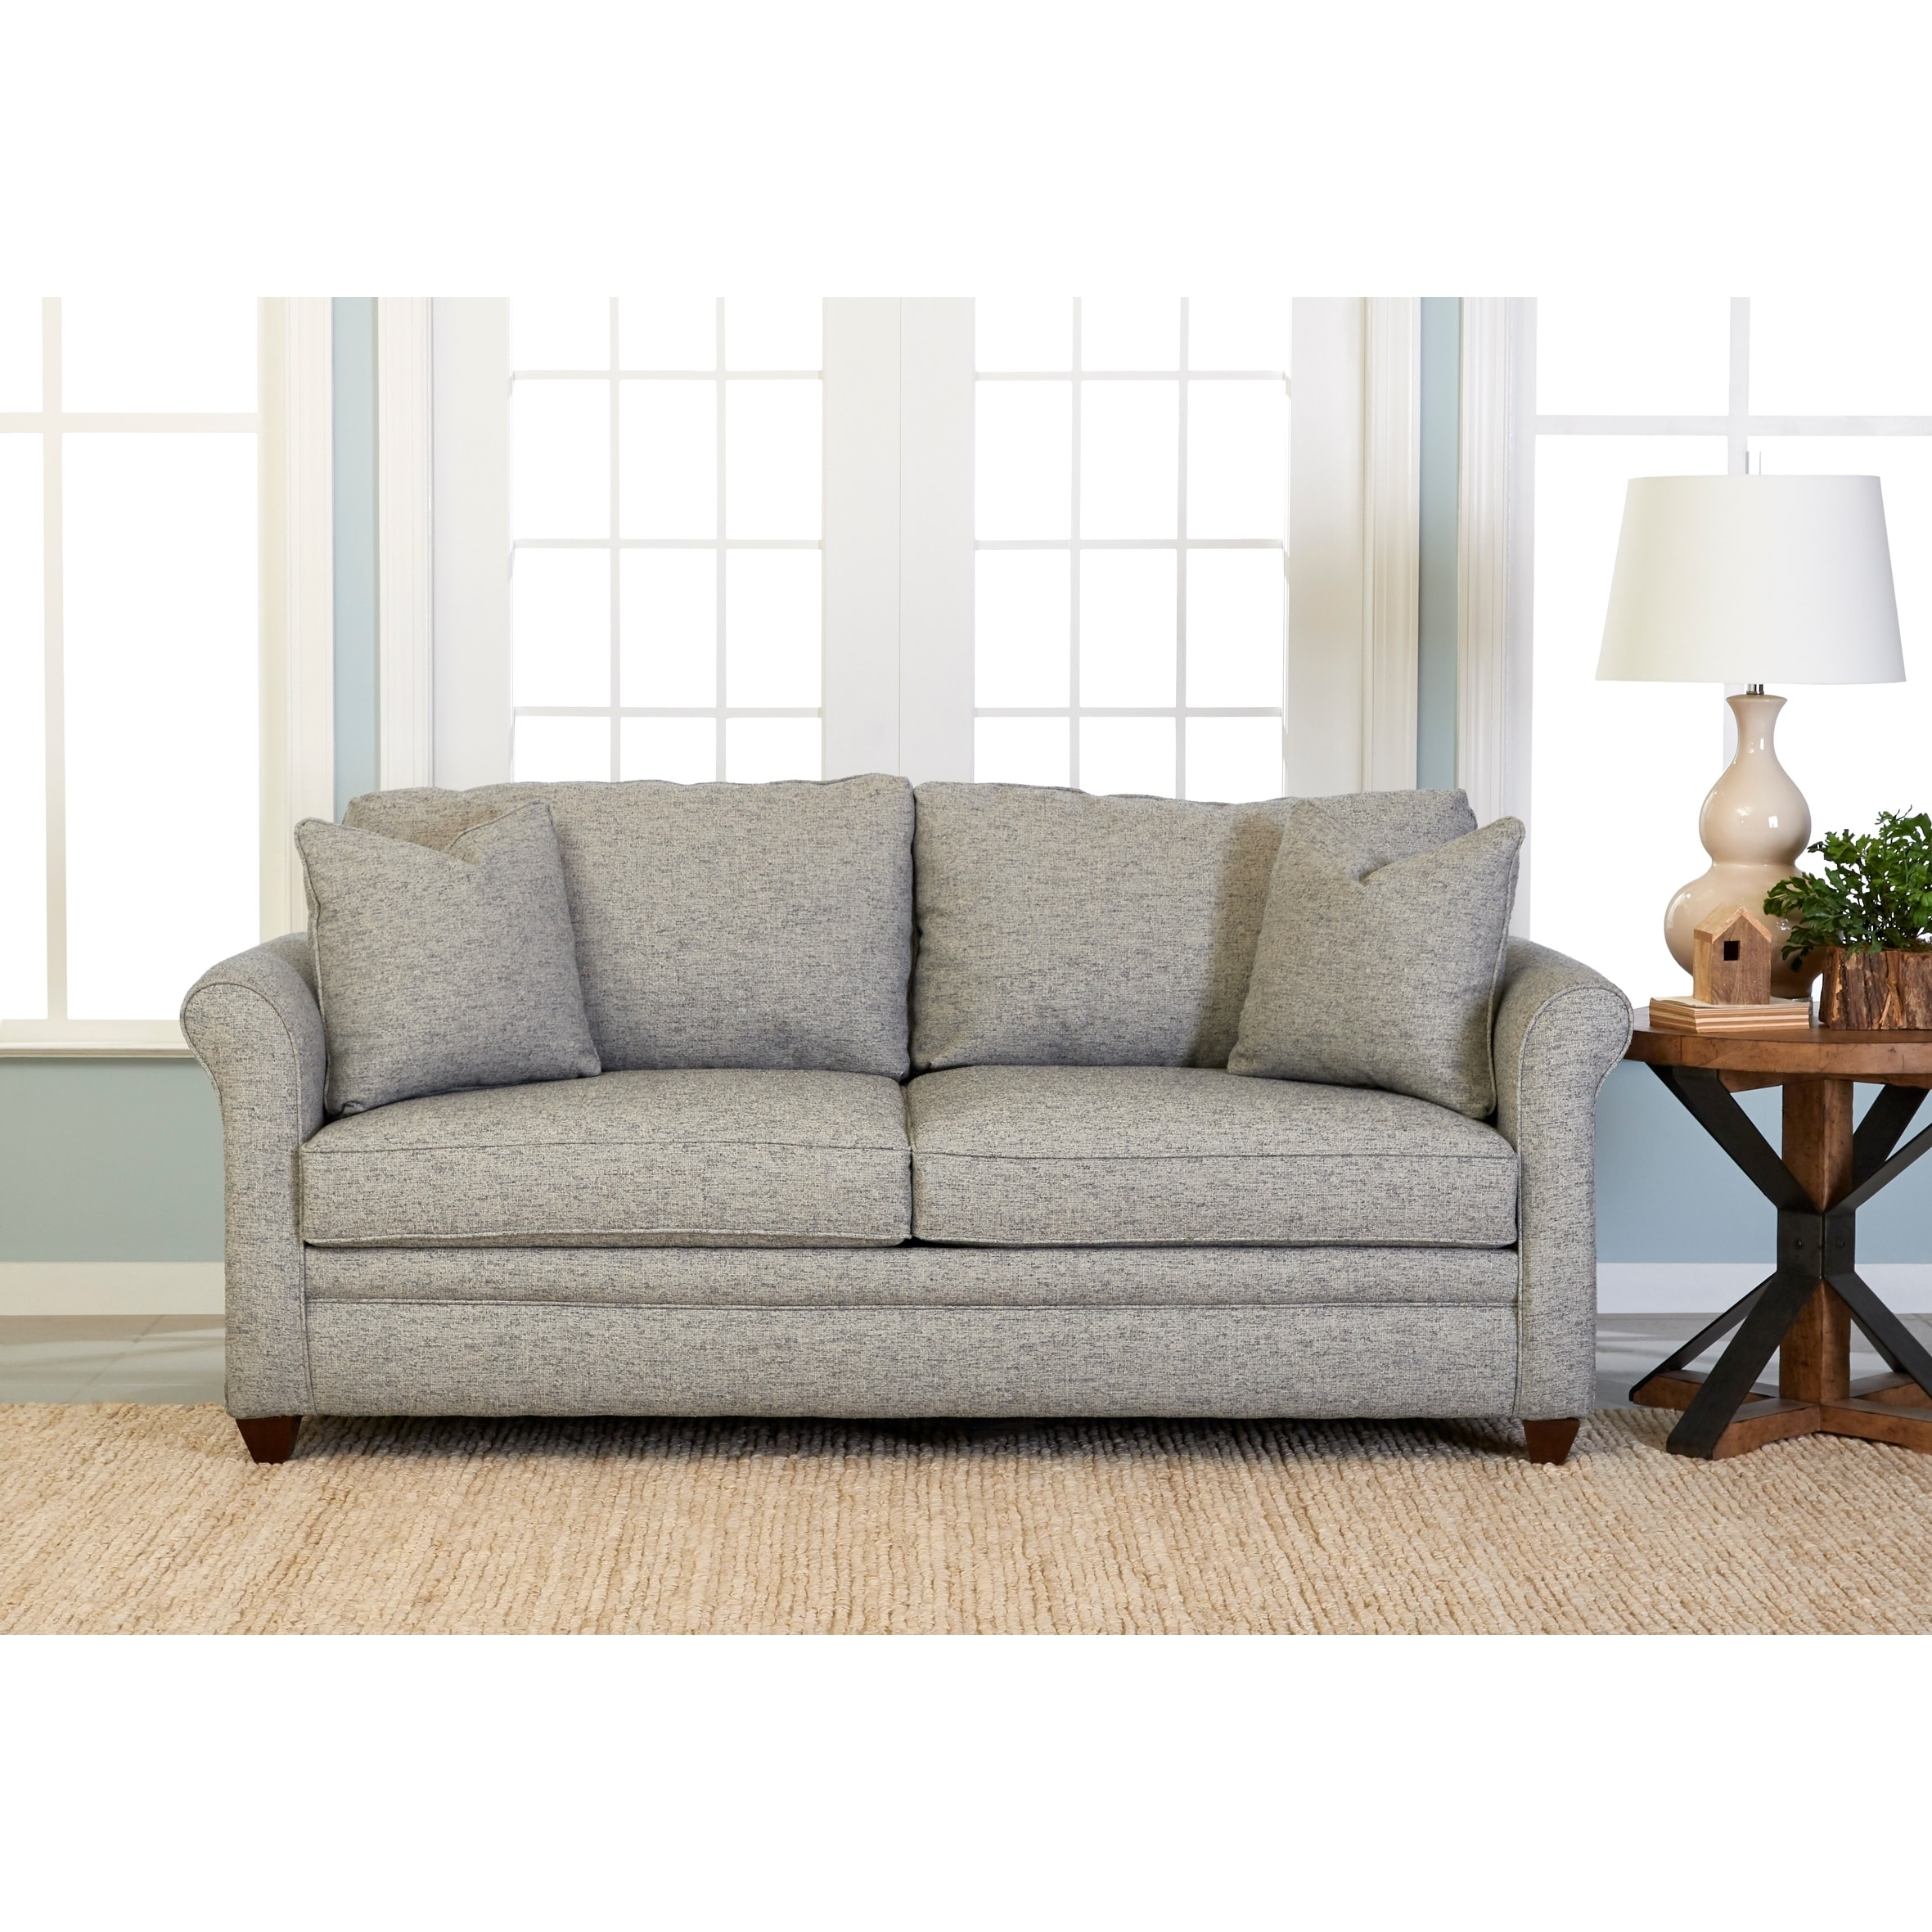 - Shop Dalton Sleeper Sofa, Queen-size - On Sale - Overstock - 29158917